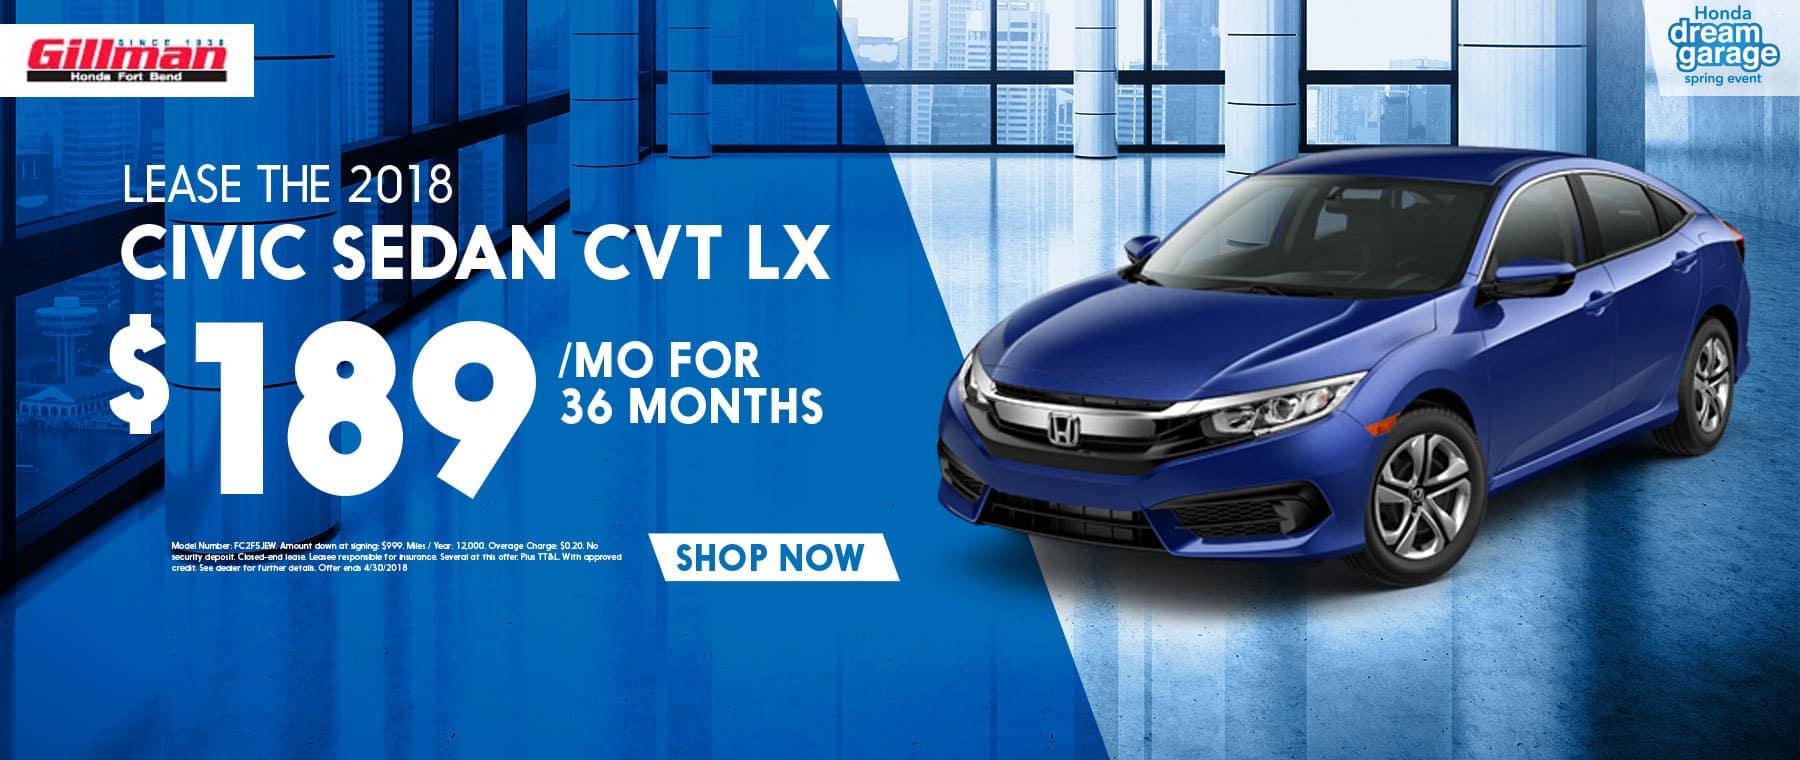 2018-honda-civic-sedan-for-sale-gillman-honda-houston-tx